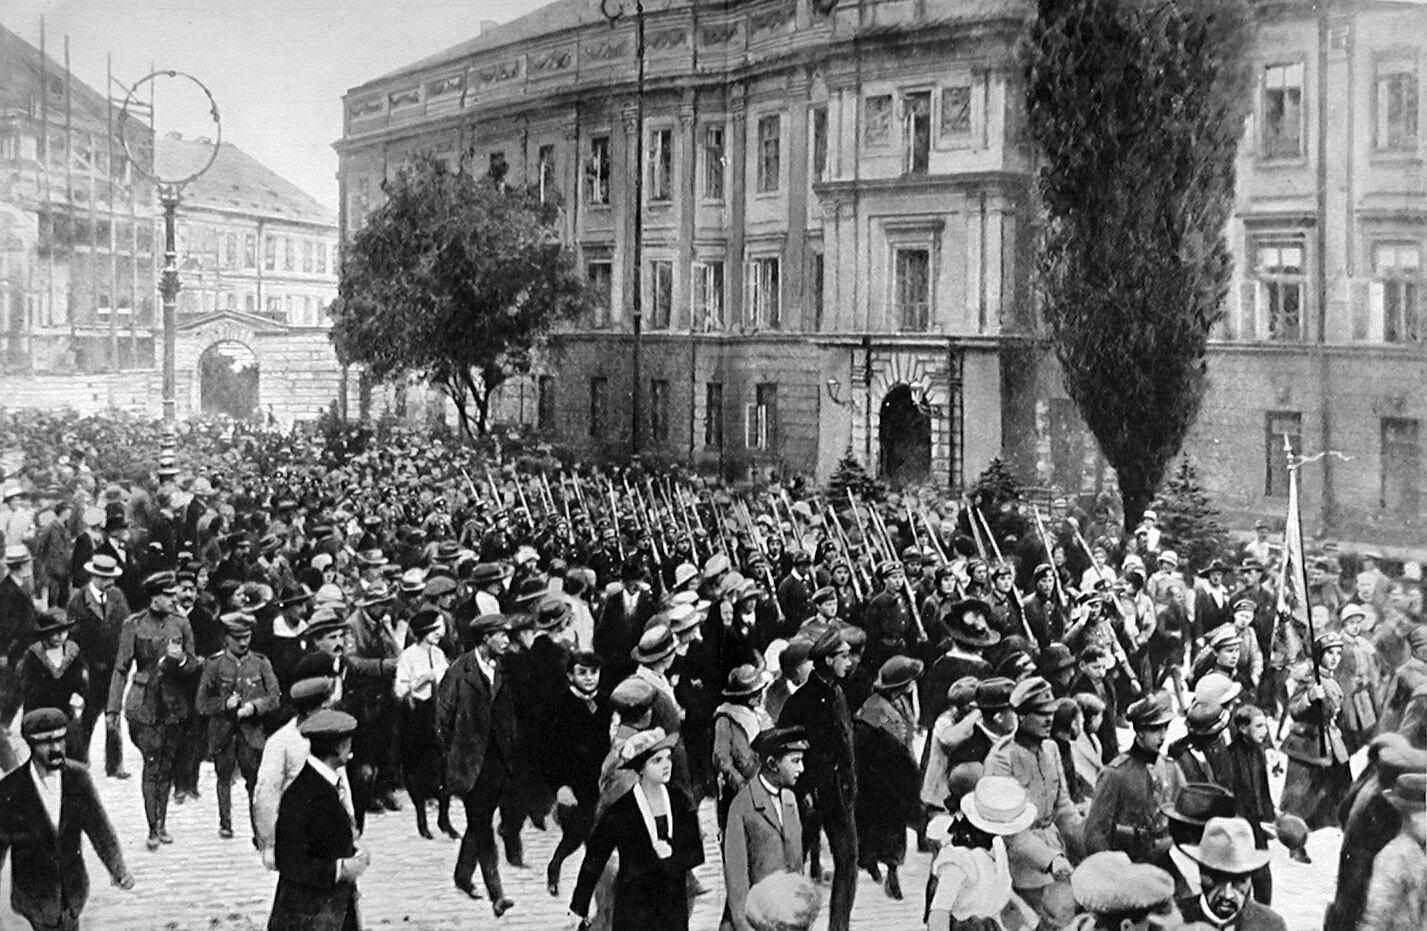 Polonia_rusia_1920.jpg